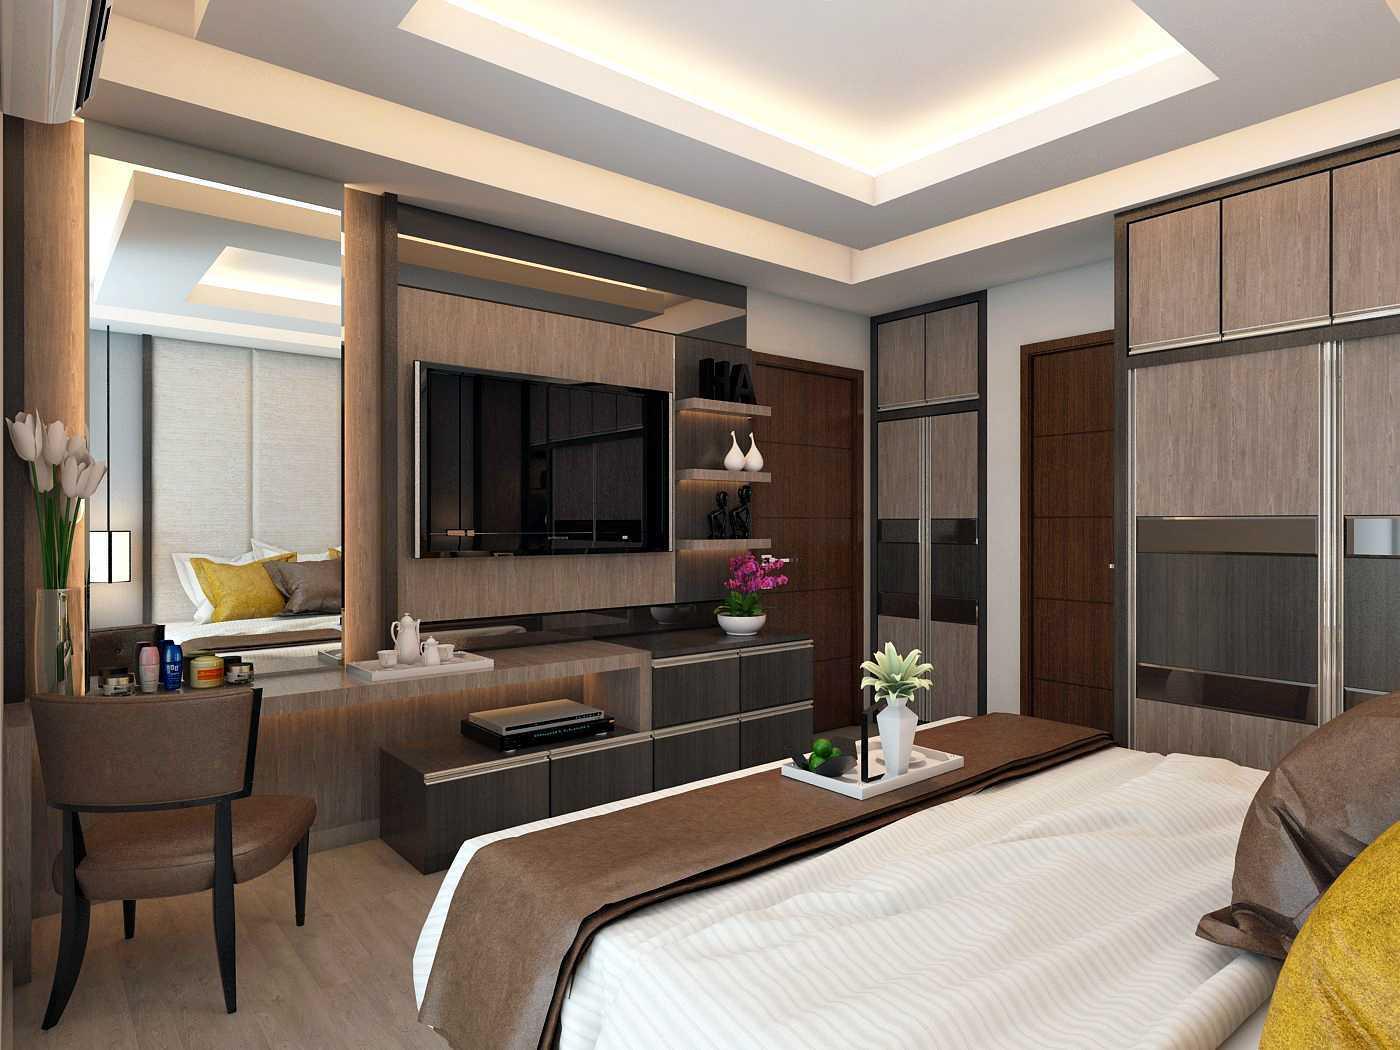 Habibullah Alfatih Condominium - Greenbay Pluit Jakarta, Indonesia Jakarta, Indonesia Master-Bedroom-1 Kontemporer  35908